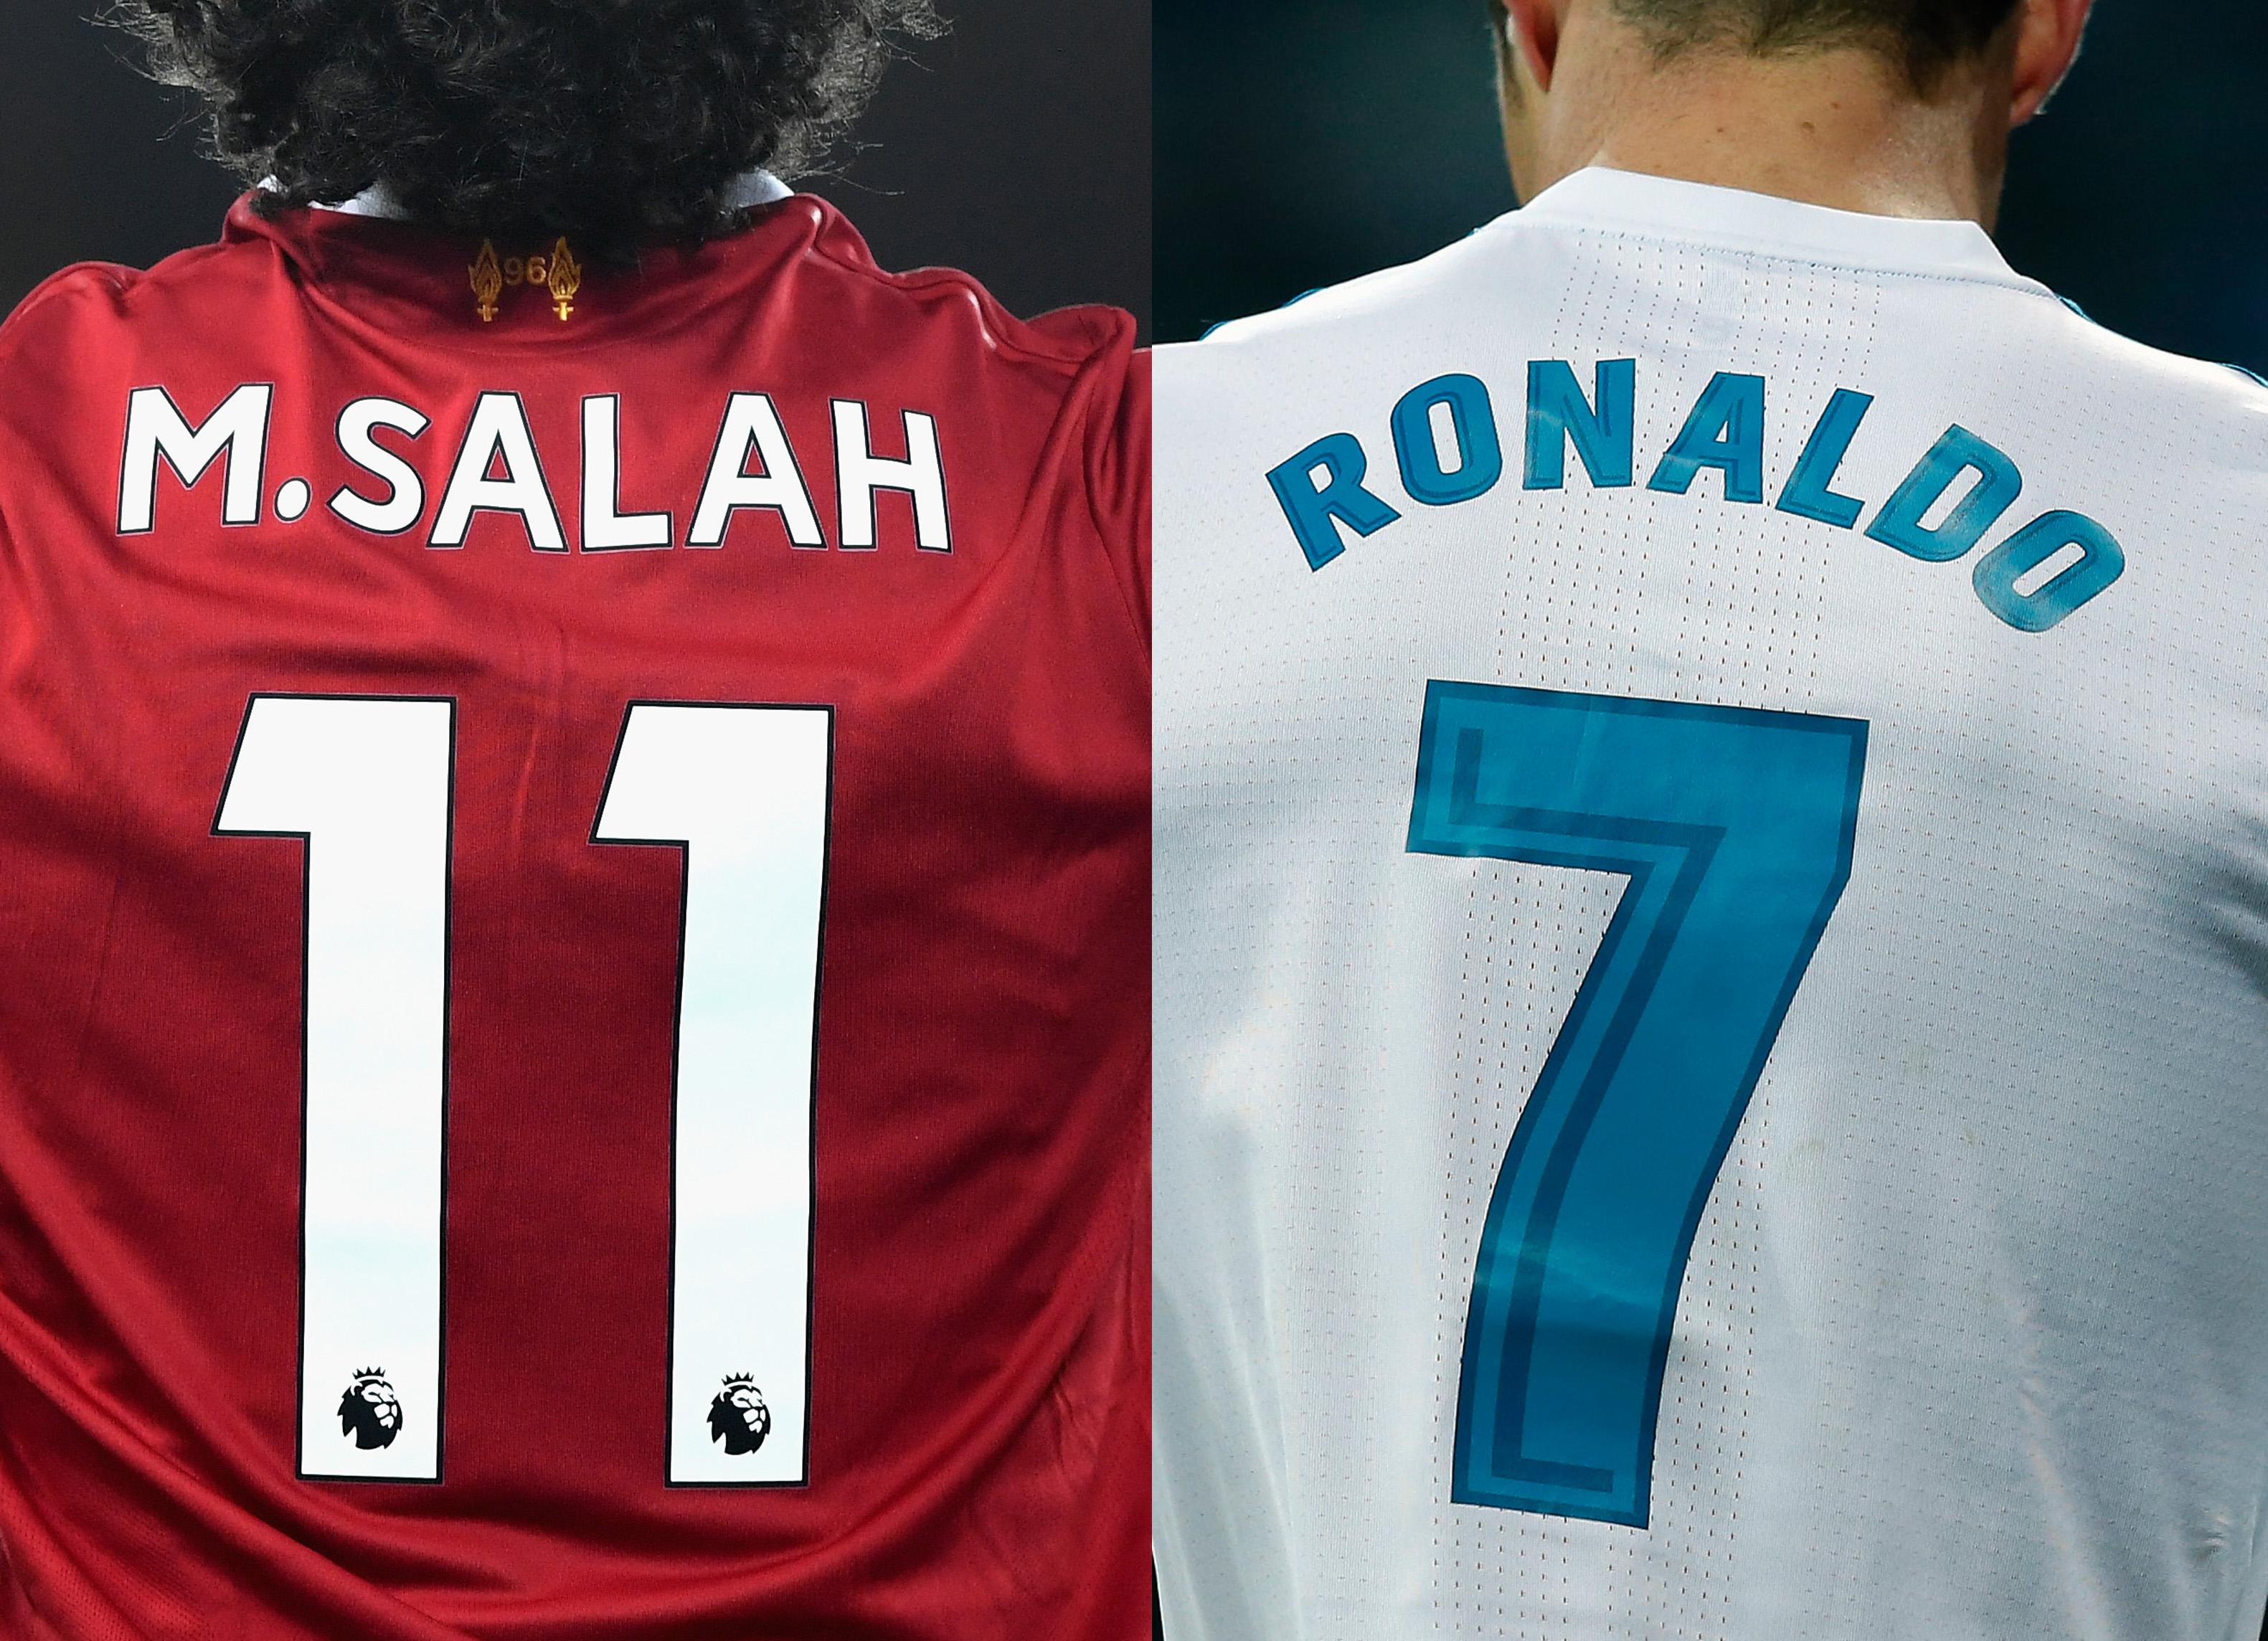 e095fb4b Mohamed Salah and Cristiano Ronaldo - Real Madrid v Liverpool - UEFA  Champions League Final